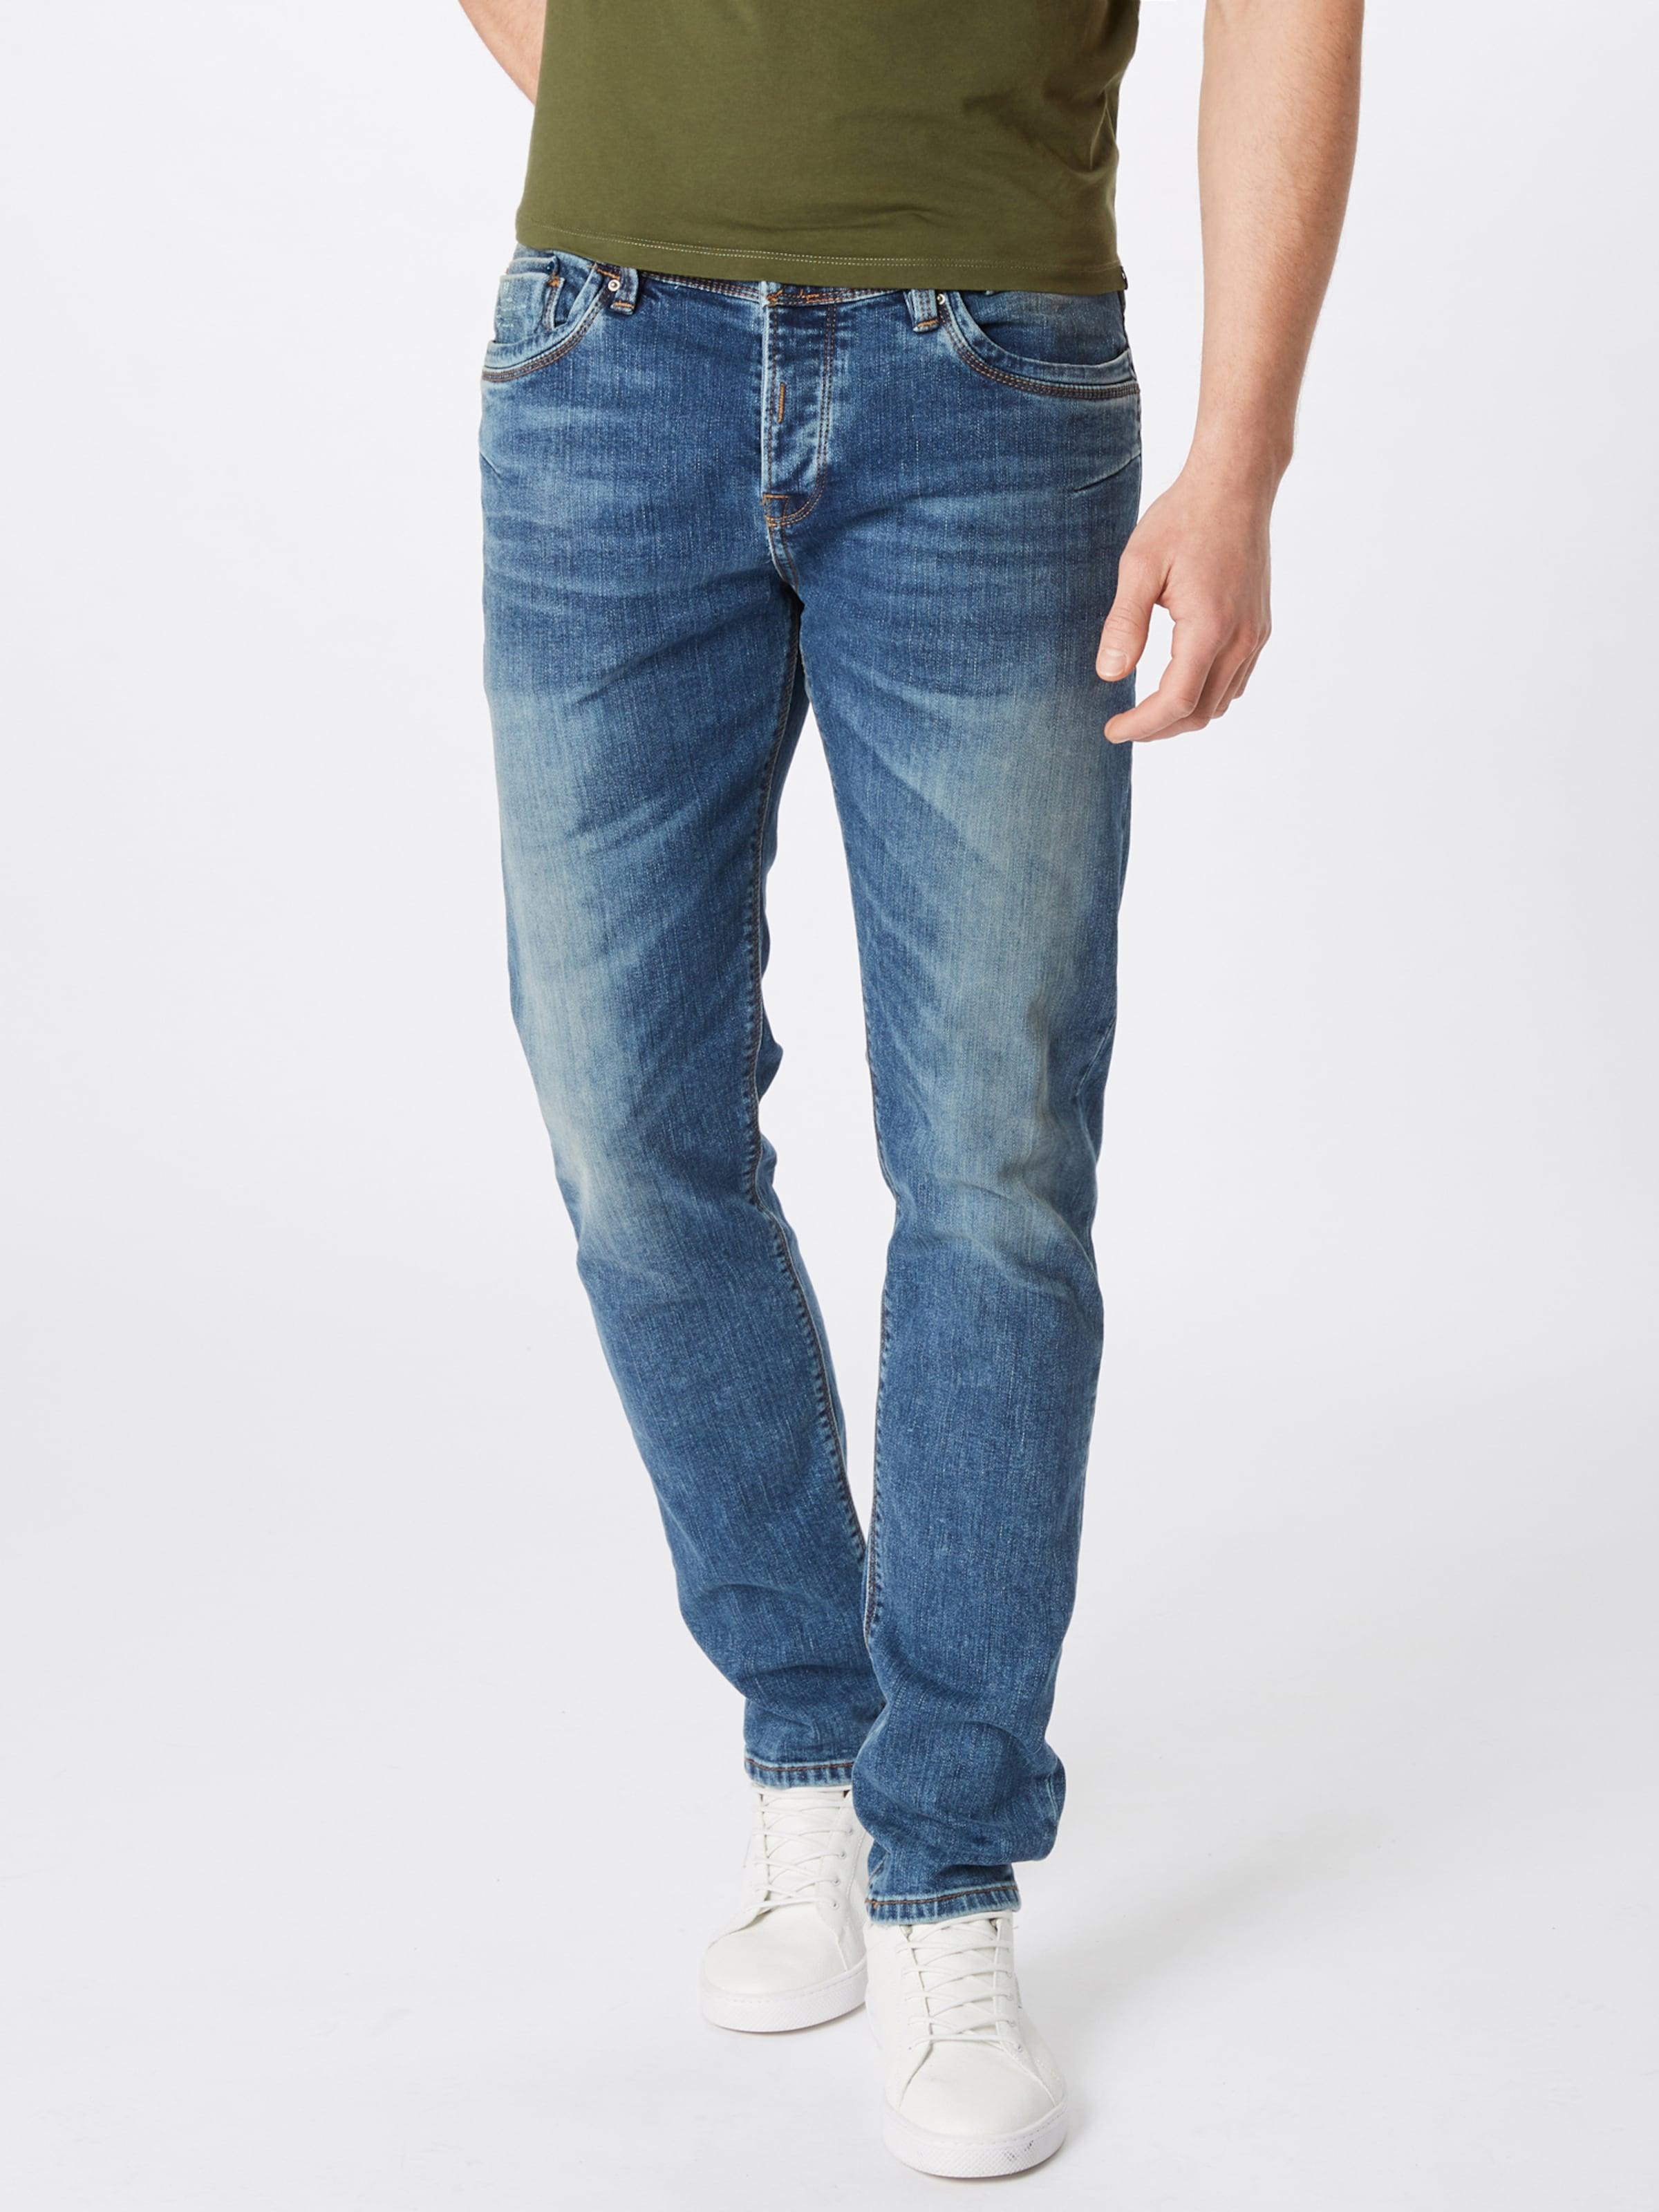 Blauw X Ltb Jeans 'servando Denim In D' 8NkwnPZ0OX